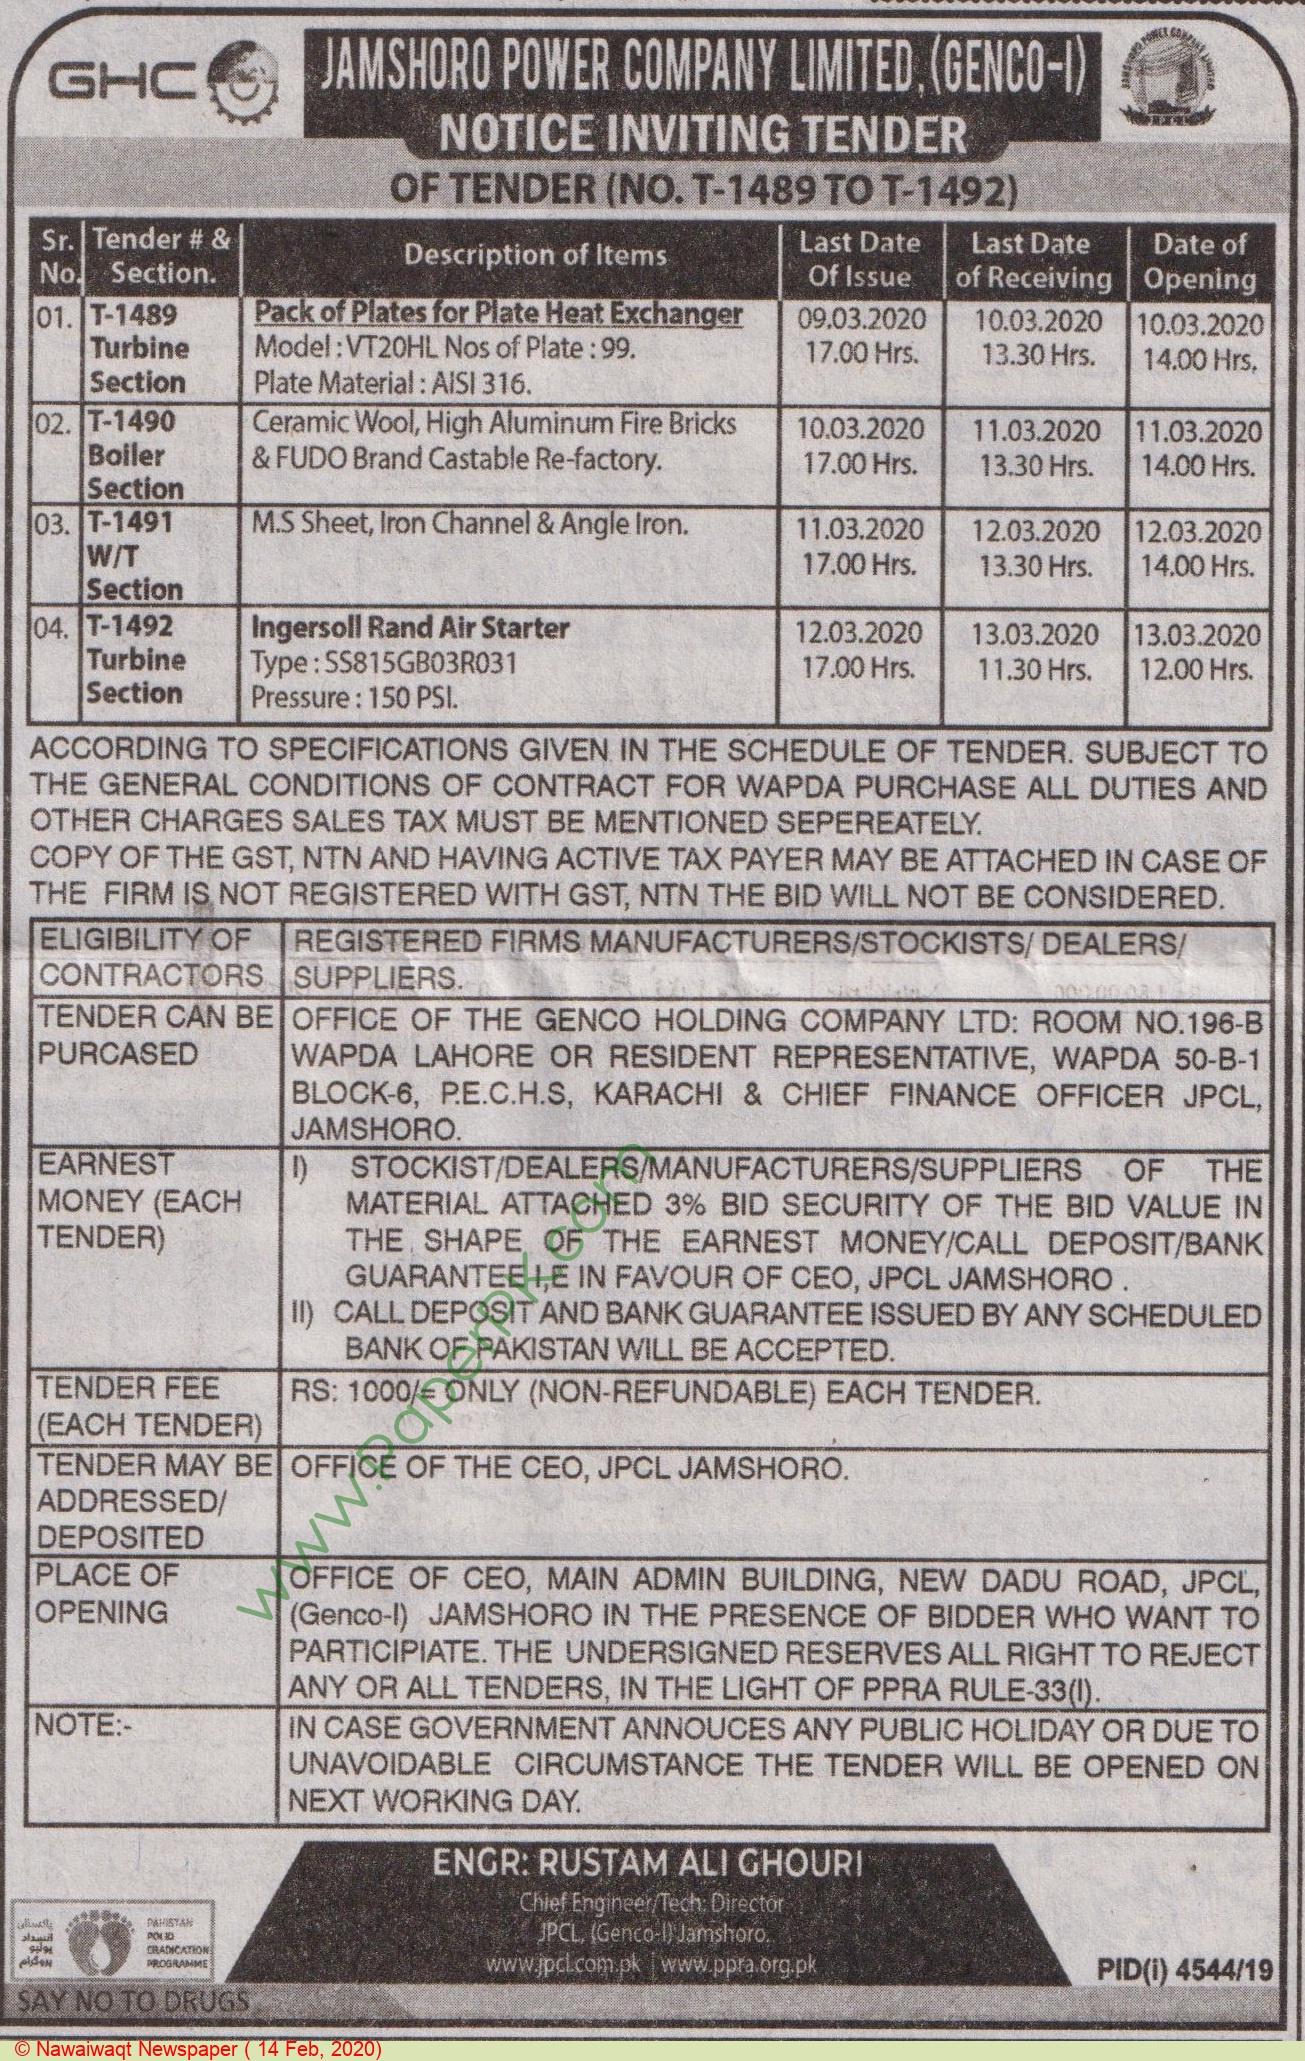 Jamshoro Power Company Limited Jamshoro Tender Notice